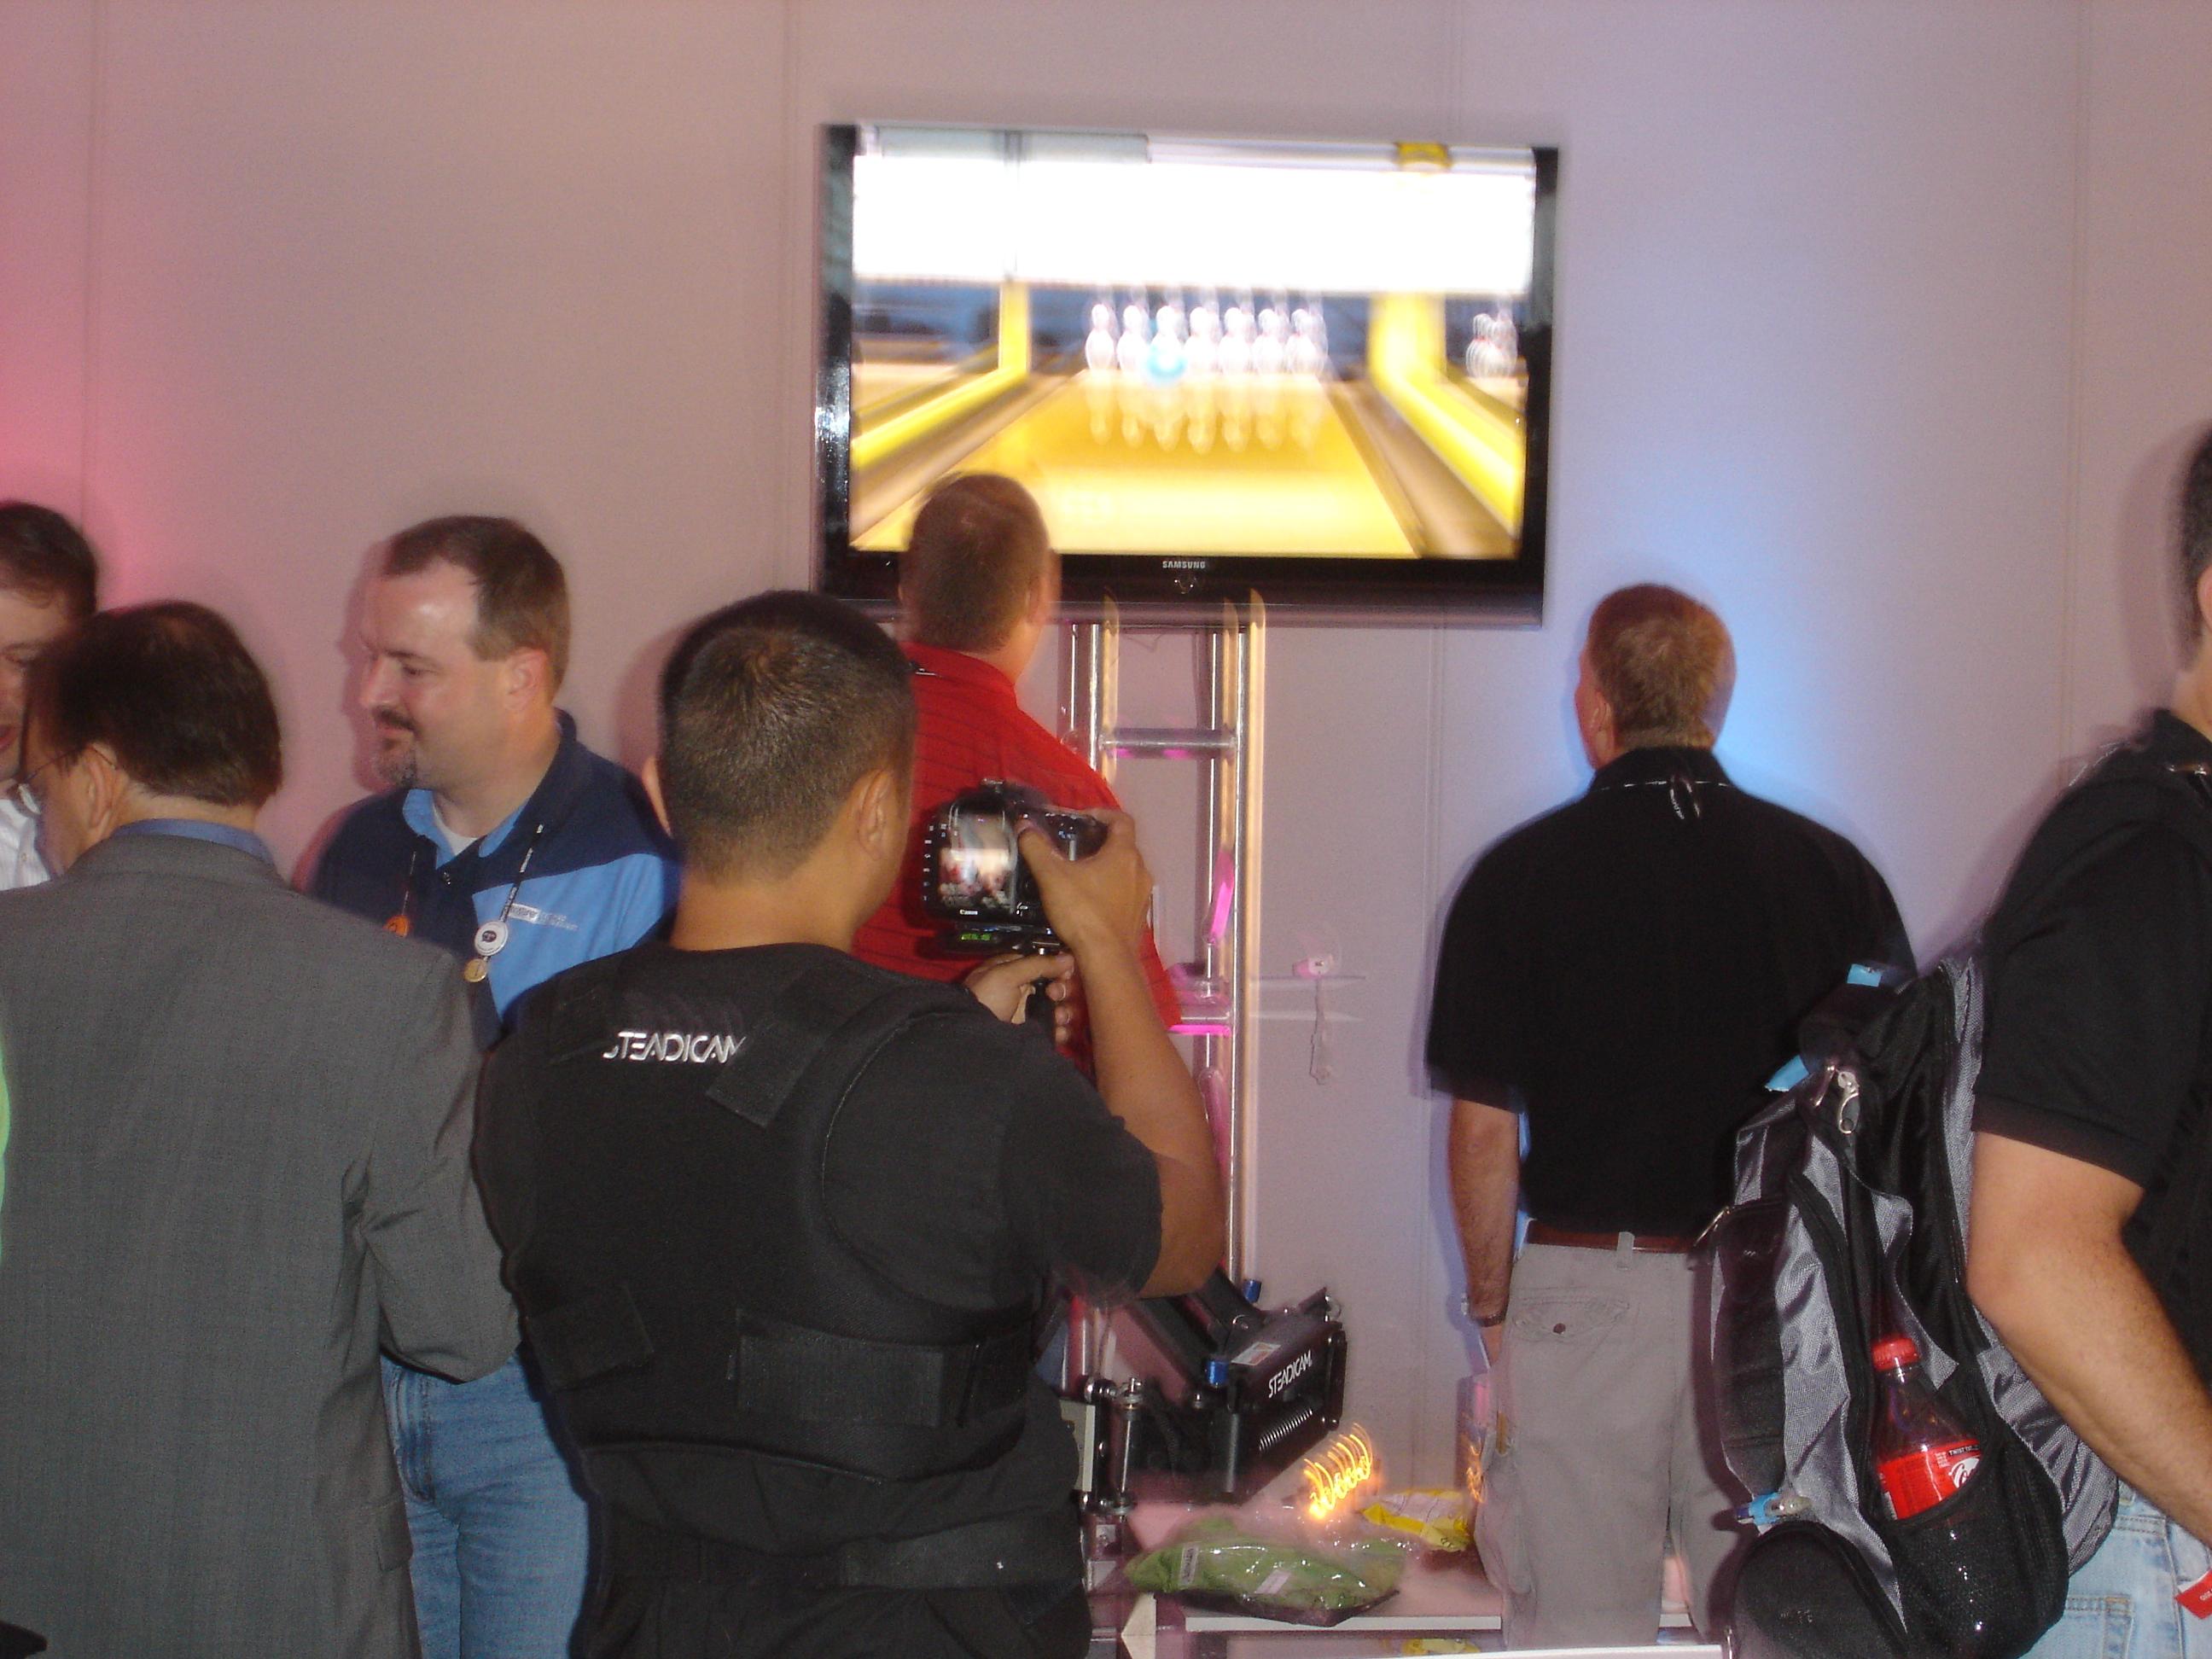 Wii Bowling Deluxe Rentals Orlando Tampa Jacksonville Miami  # Plasma De Luxe